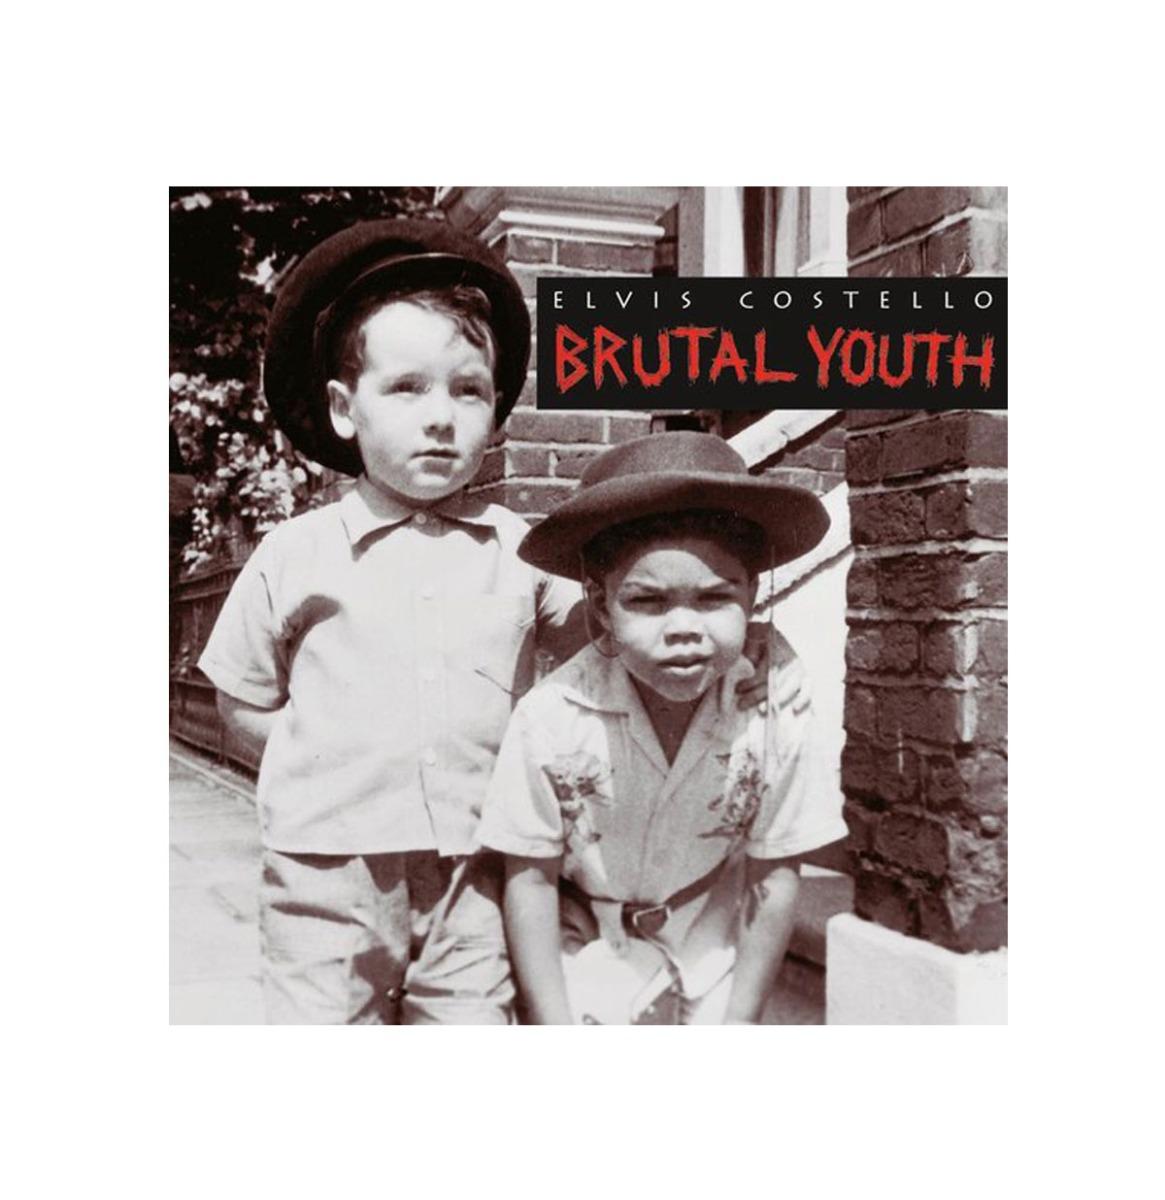 Elvis Costello - Brutal Youth - 2 LP